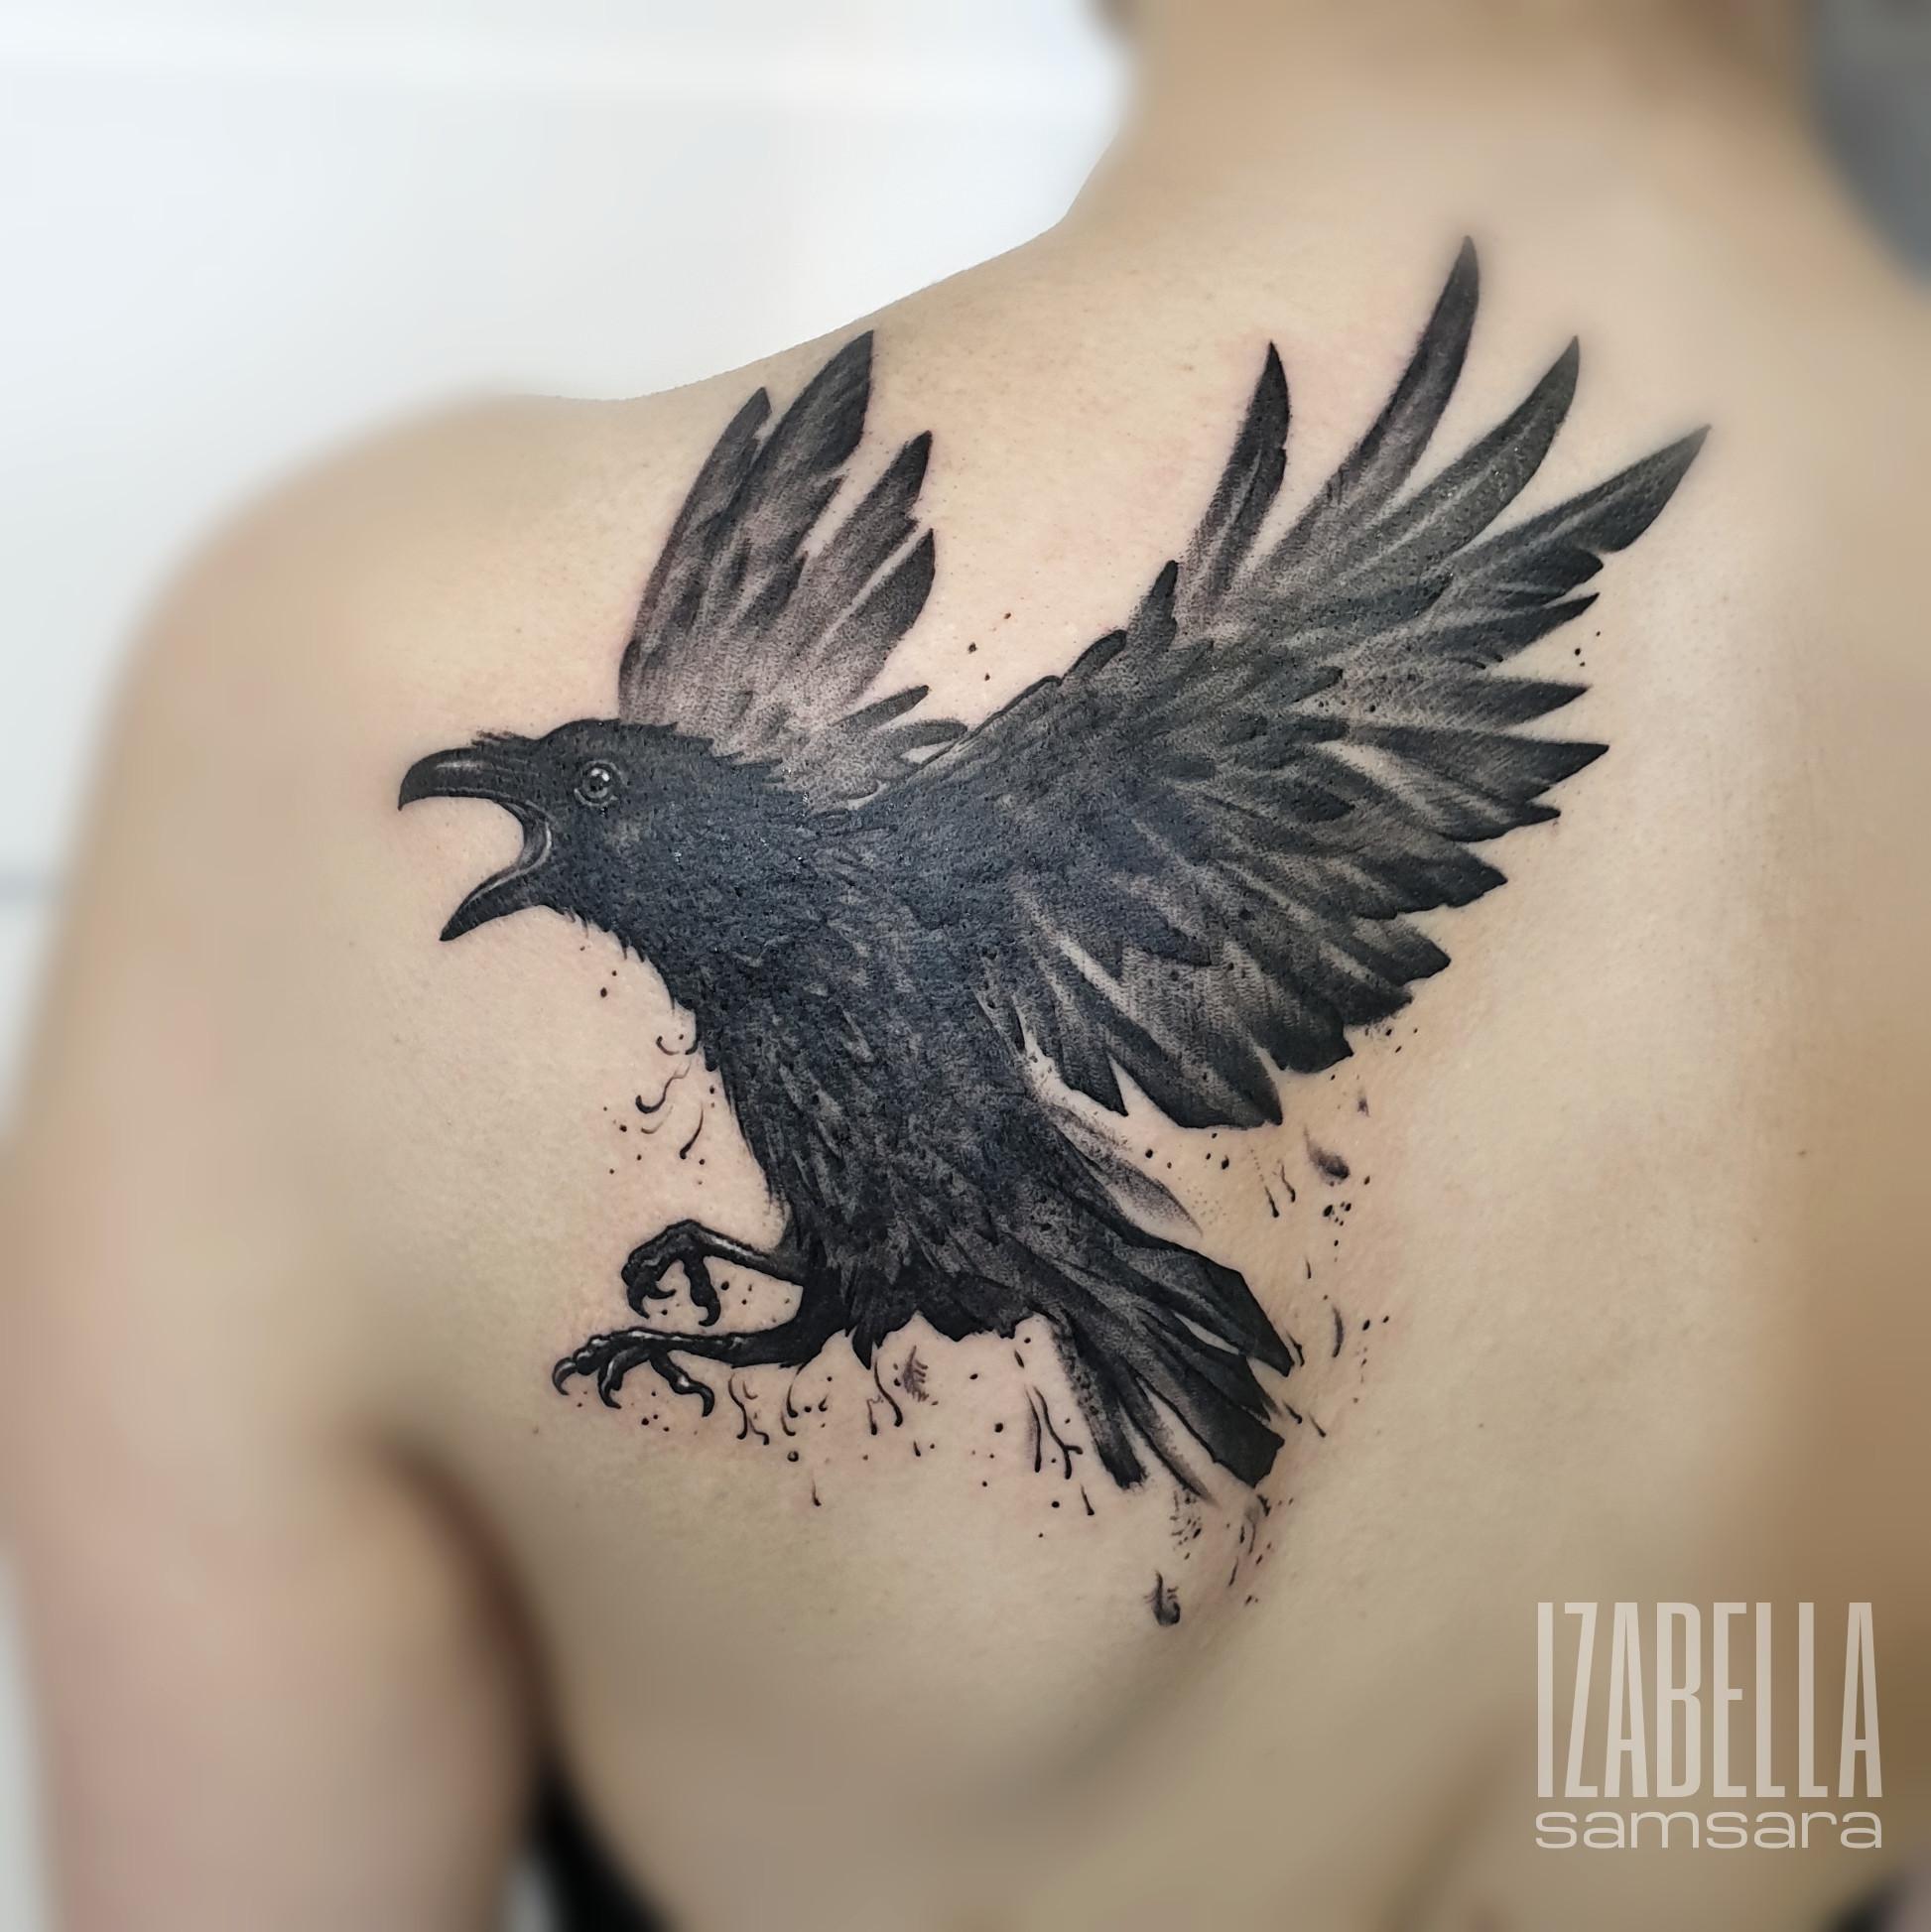 czarny kruk black raven